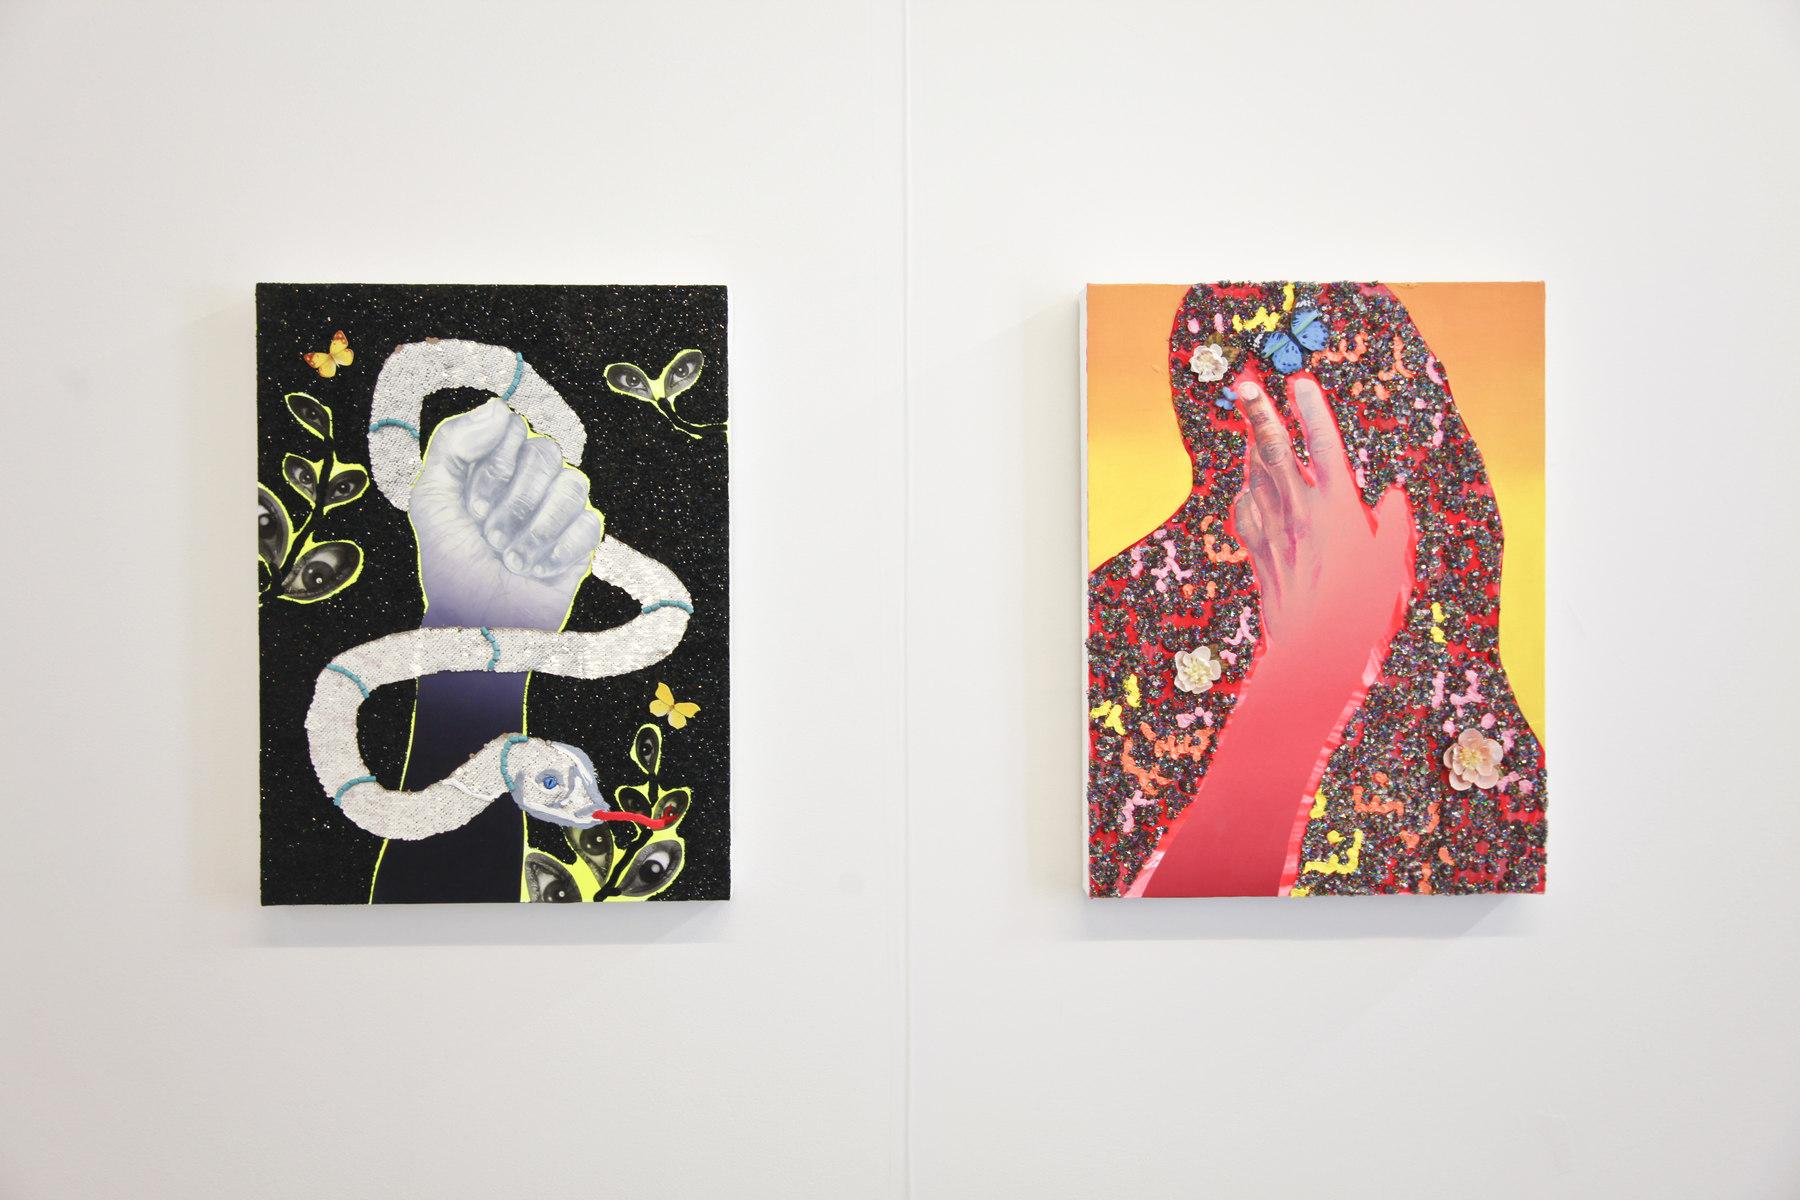 Devan Shimoyama at Stems Gallery 01